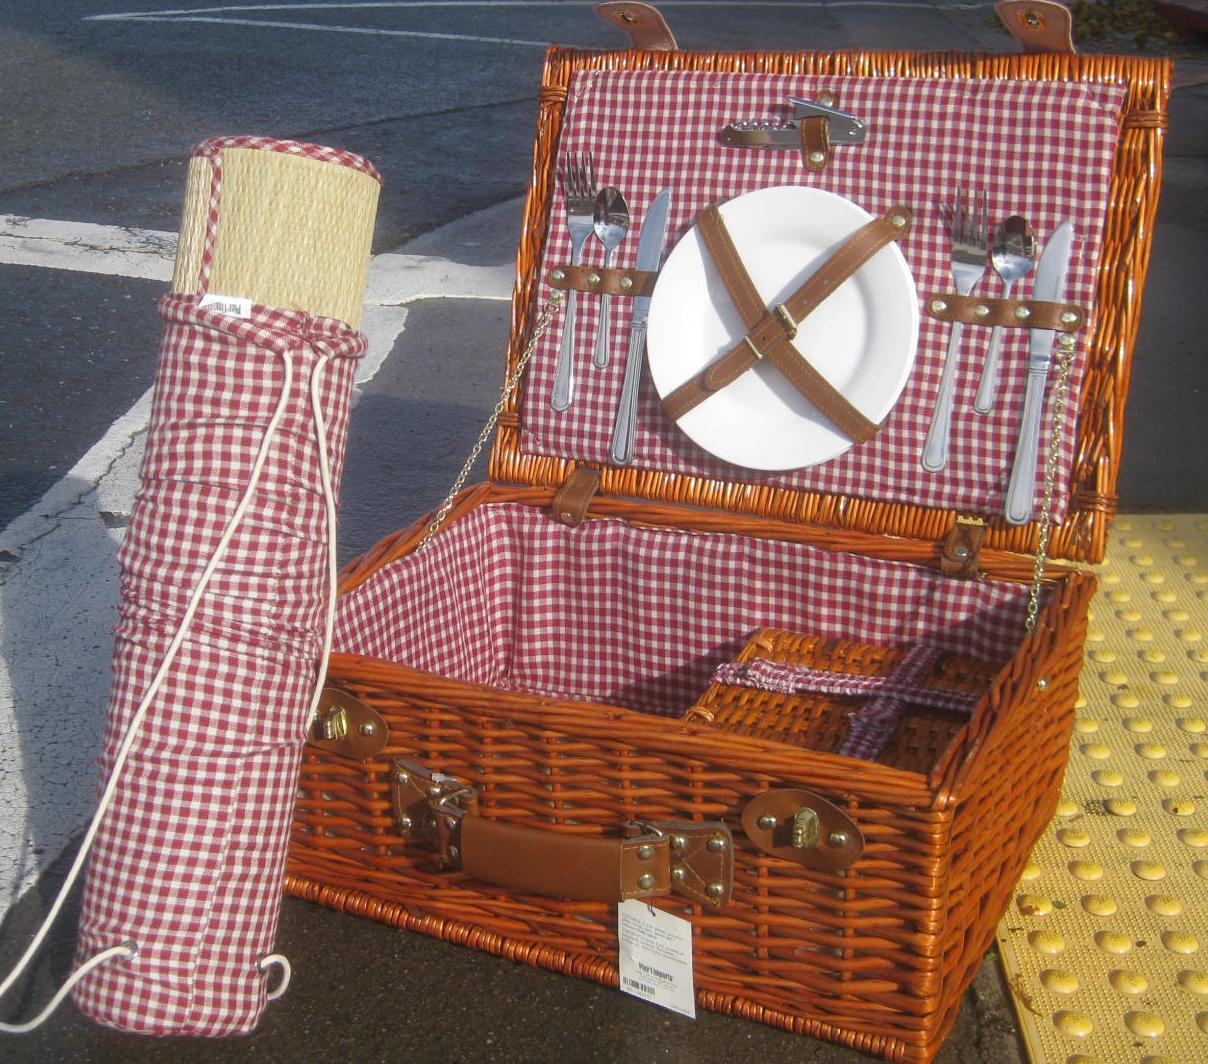 Uhuru Furniture Collectibles Sold Chic Pier 1 Wicker Picnic Set 45